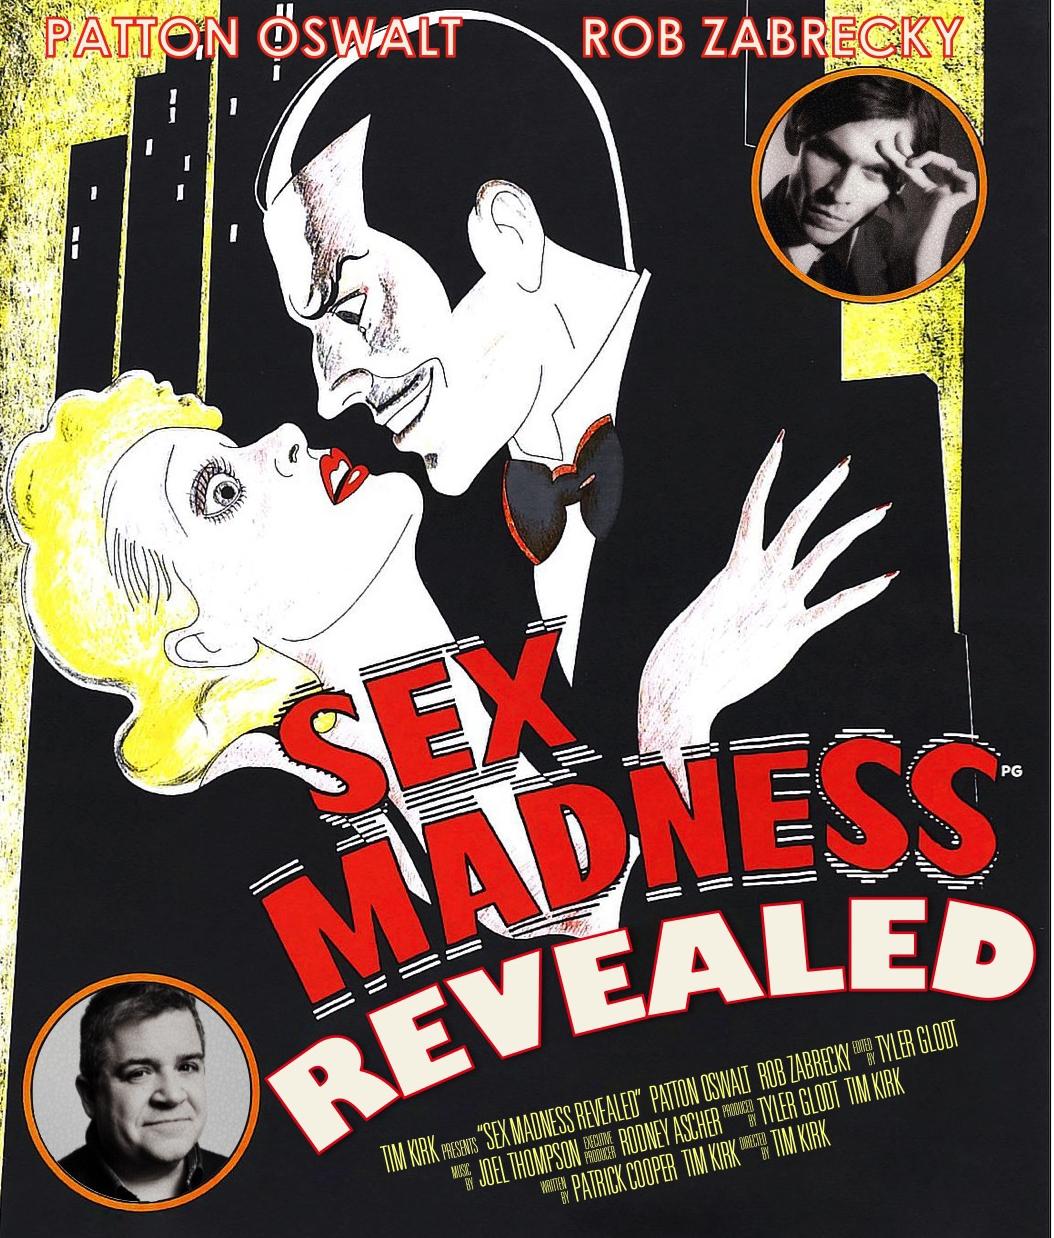 Sex Madness Revealed Poster.jpg